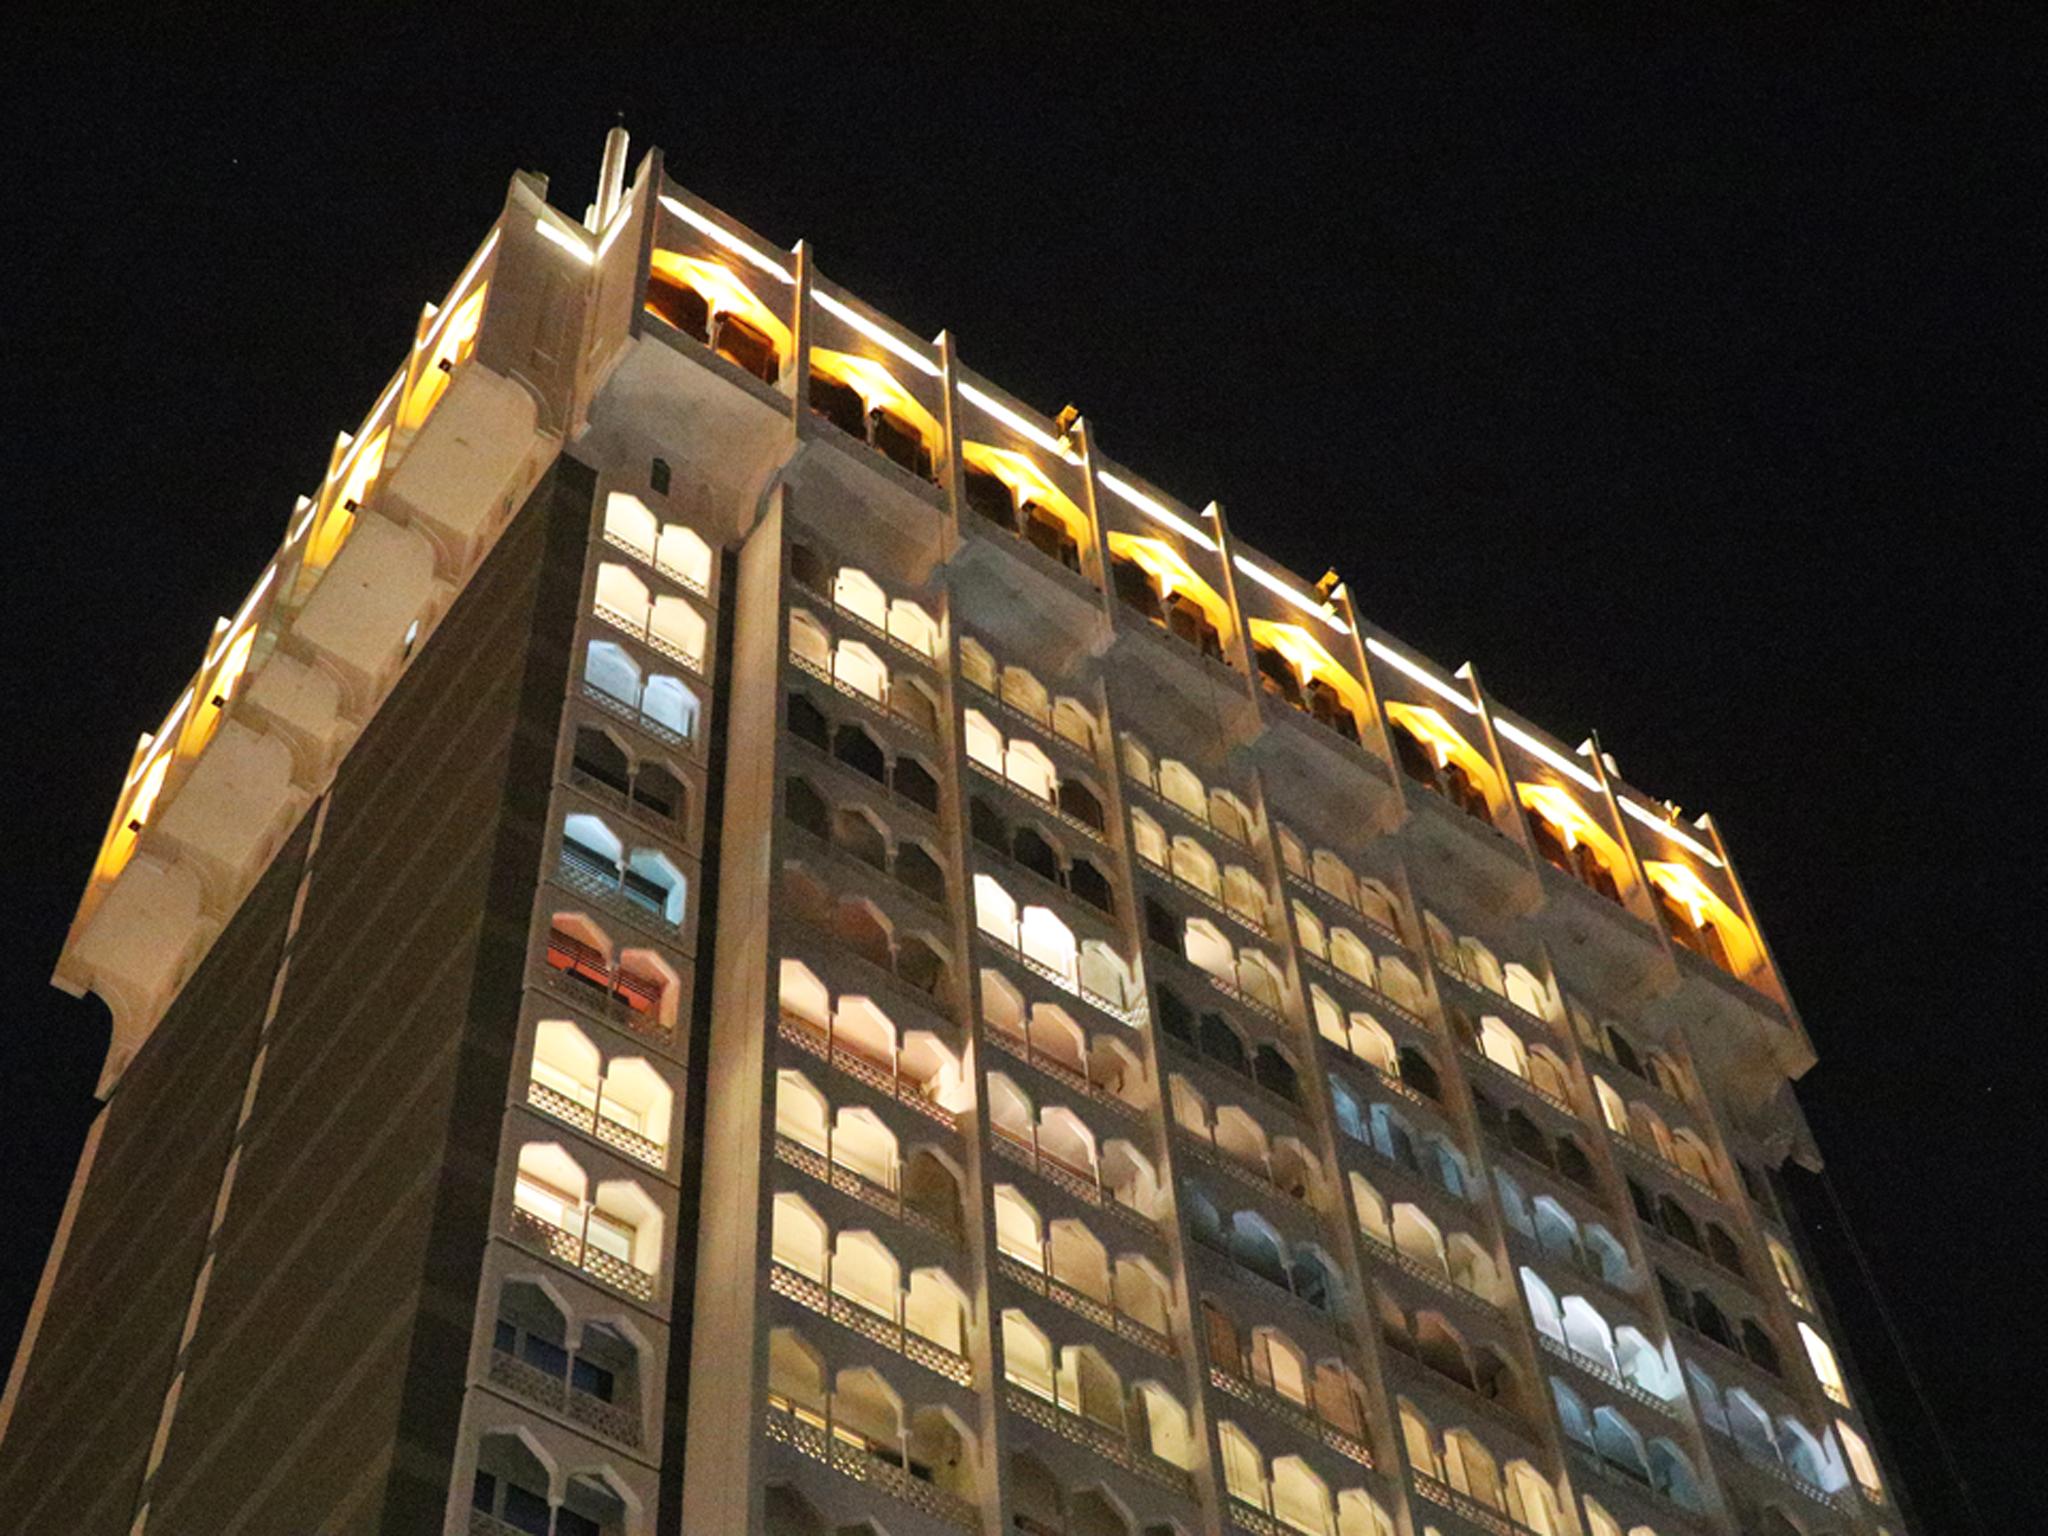 5 Star Hotel In Hyderabad Taj Krishna Banjara Hills Hyderabad - Bangalore-taj-hotels-the-happening-landmark-of-the-city